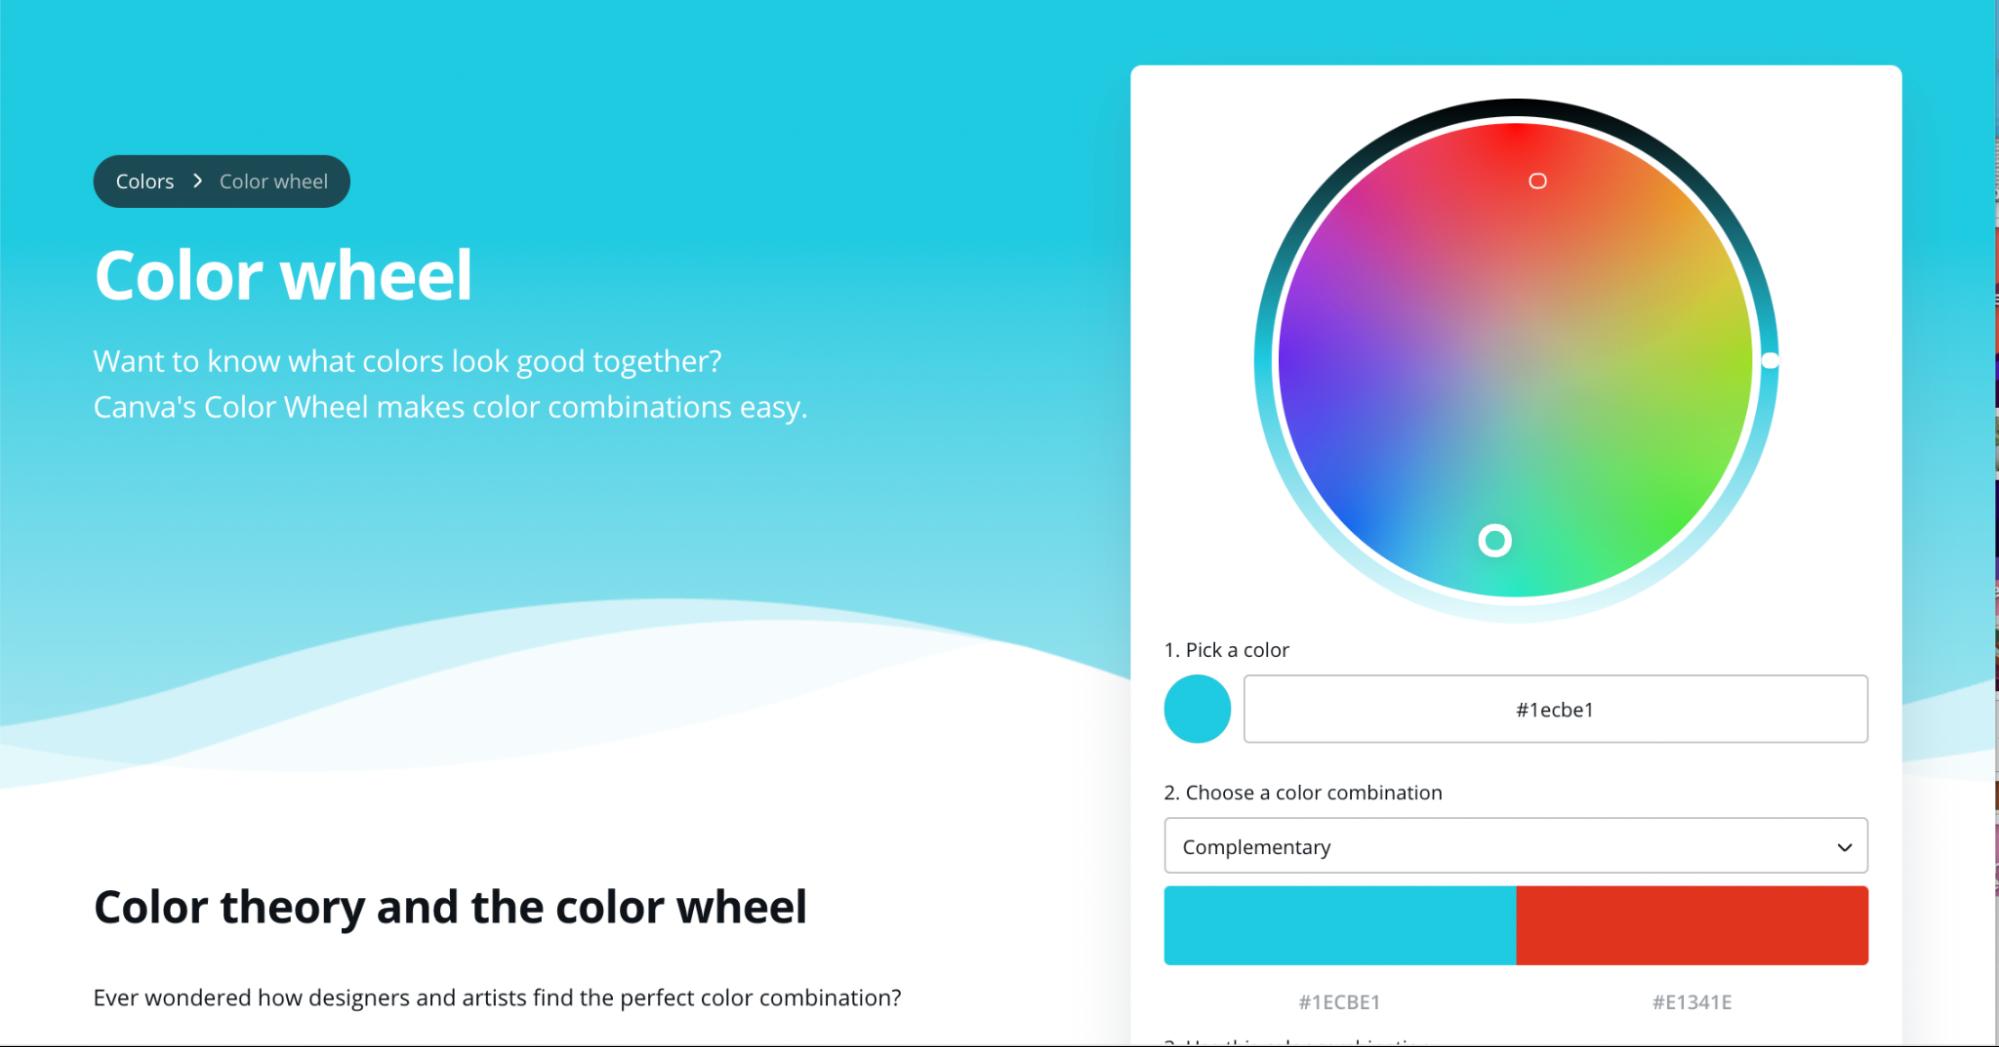 landing page optimization - canva color wheel